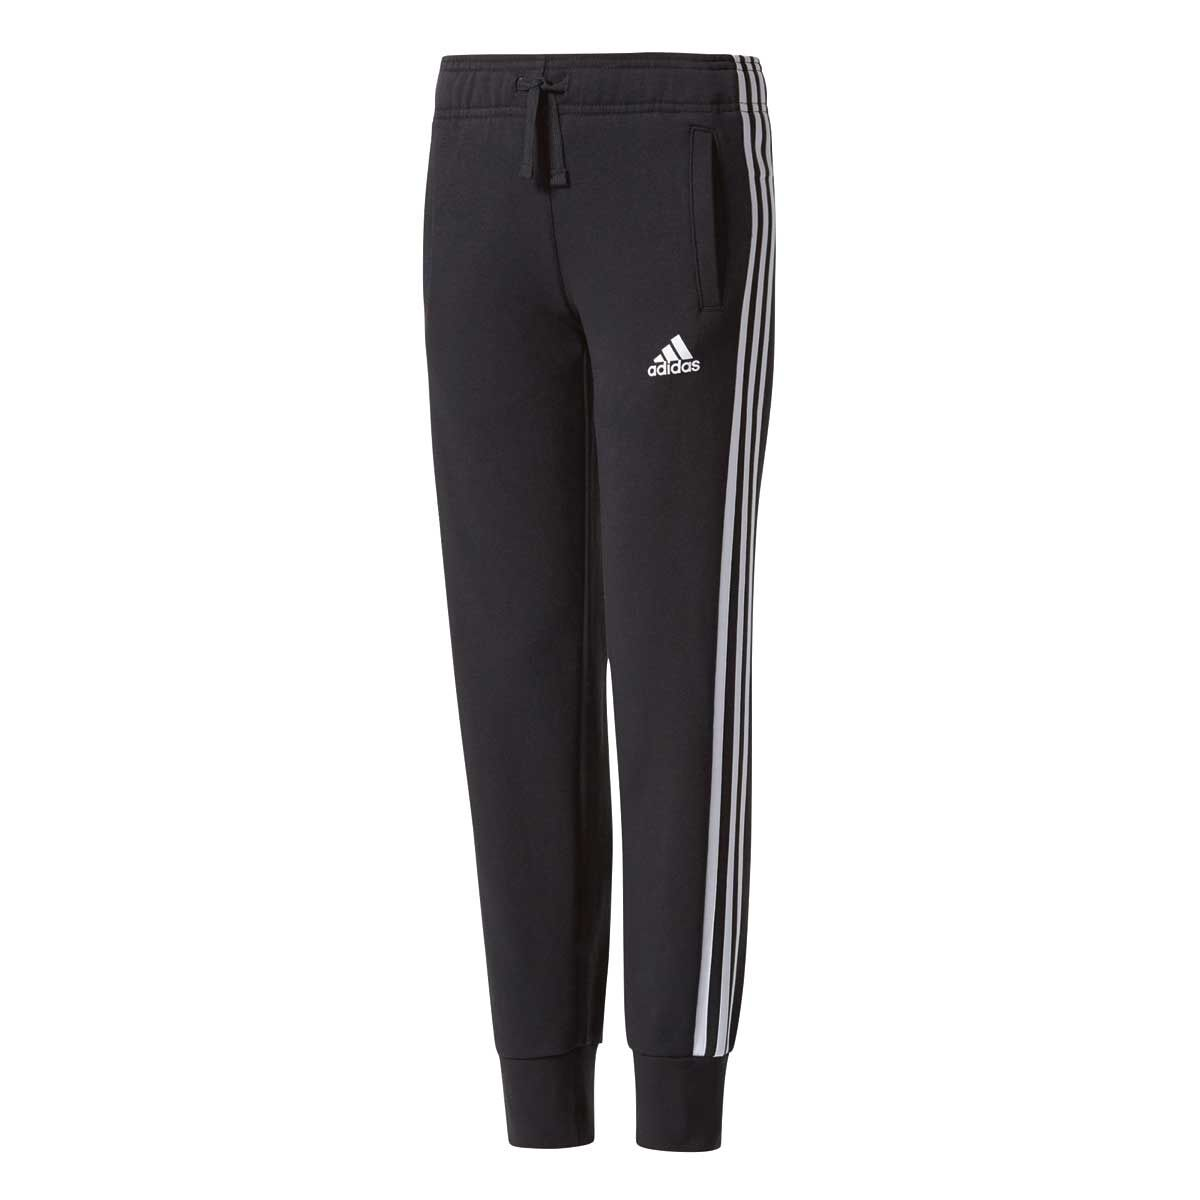 adidas Girls Essentials 3 Stripes Track Pants